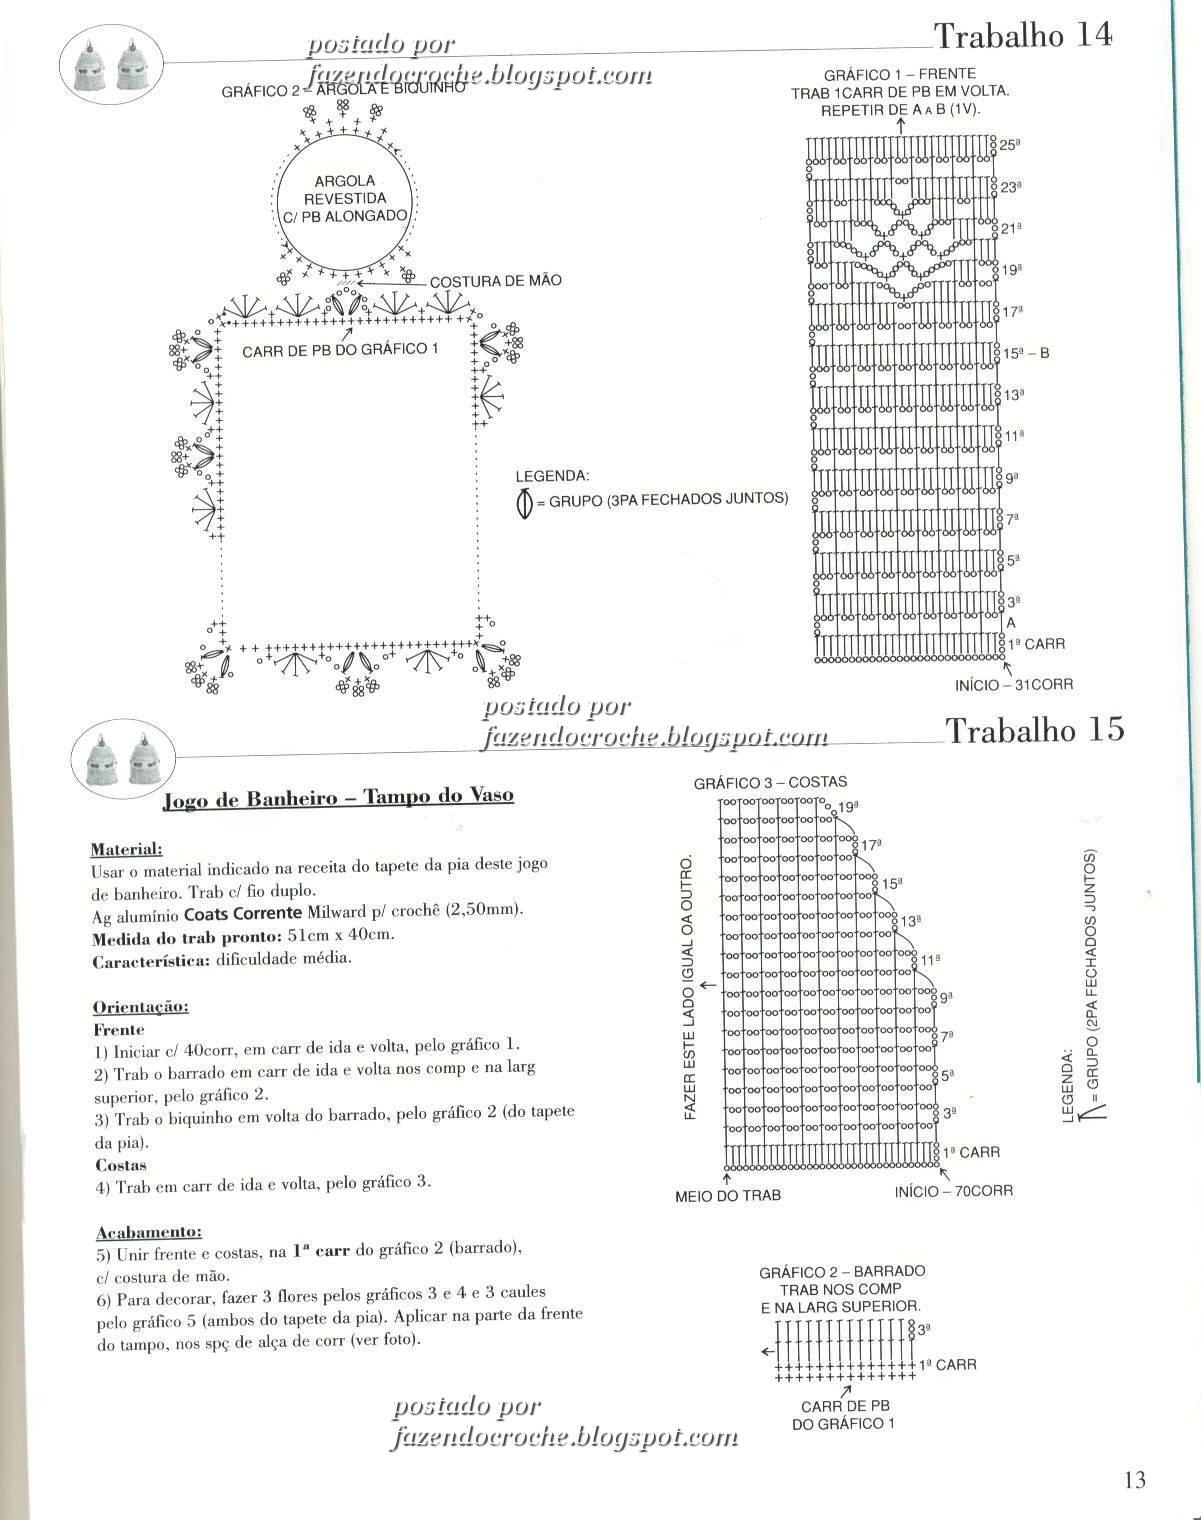 http://3.bp.blogspot.com/_4ioKeTbrdTA/S_0FYVtOR-I/AAAAAAAAKlc/rHTdSE89Ixo/s1600/tapeterec2.jpg